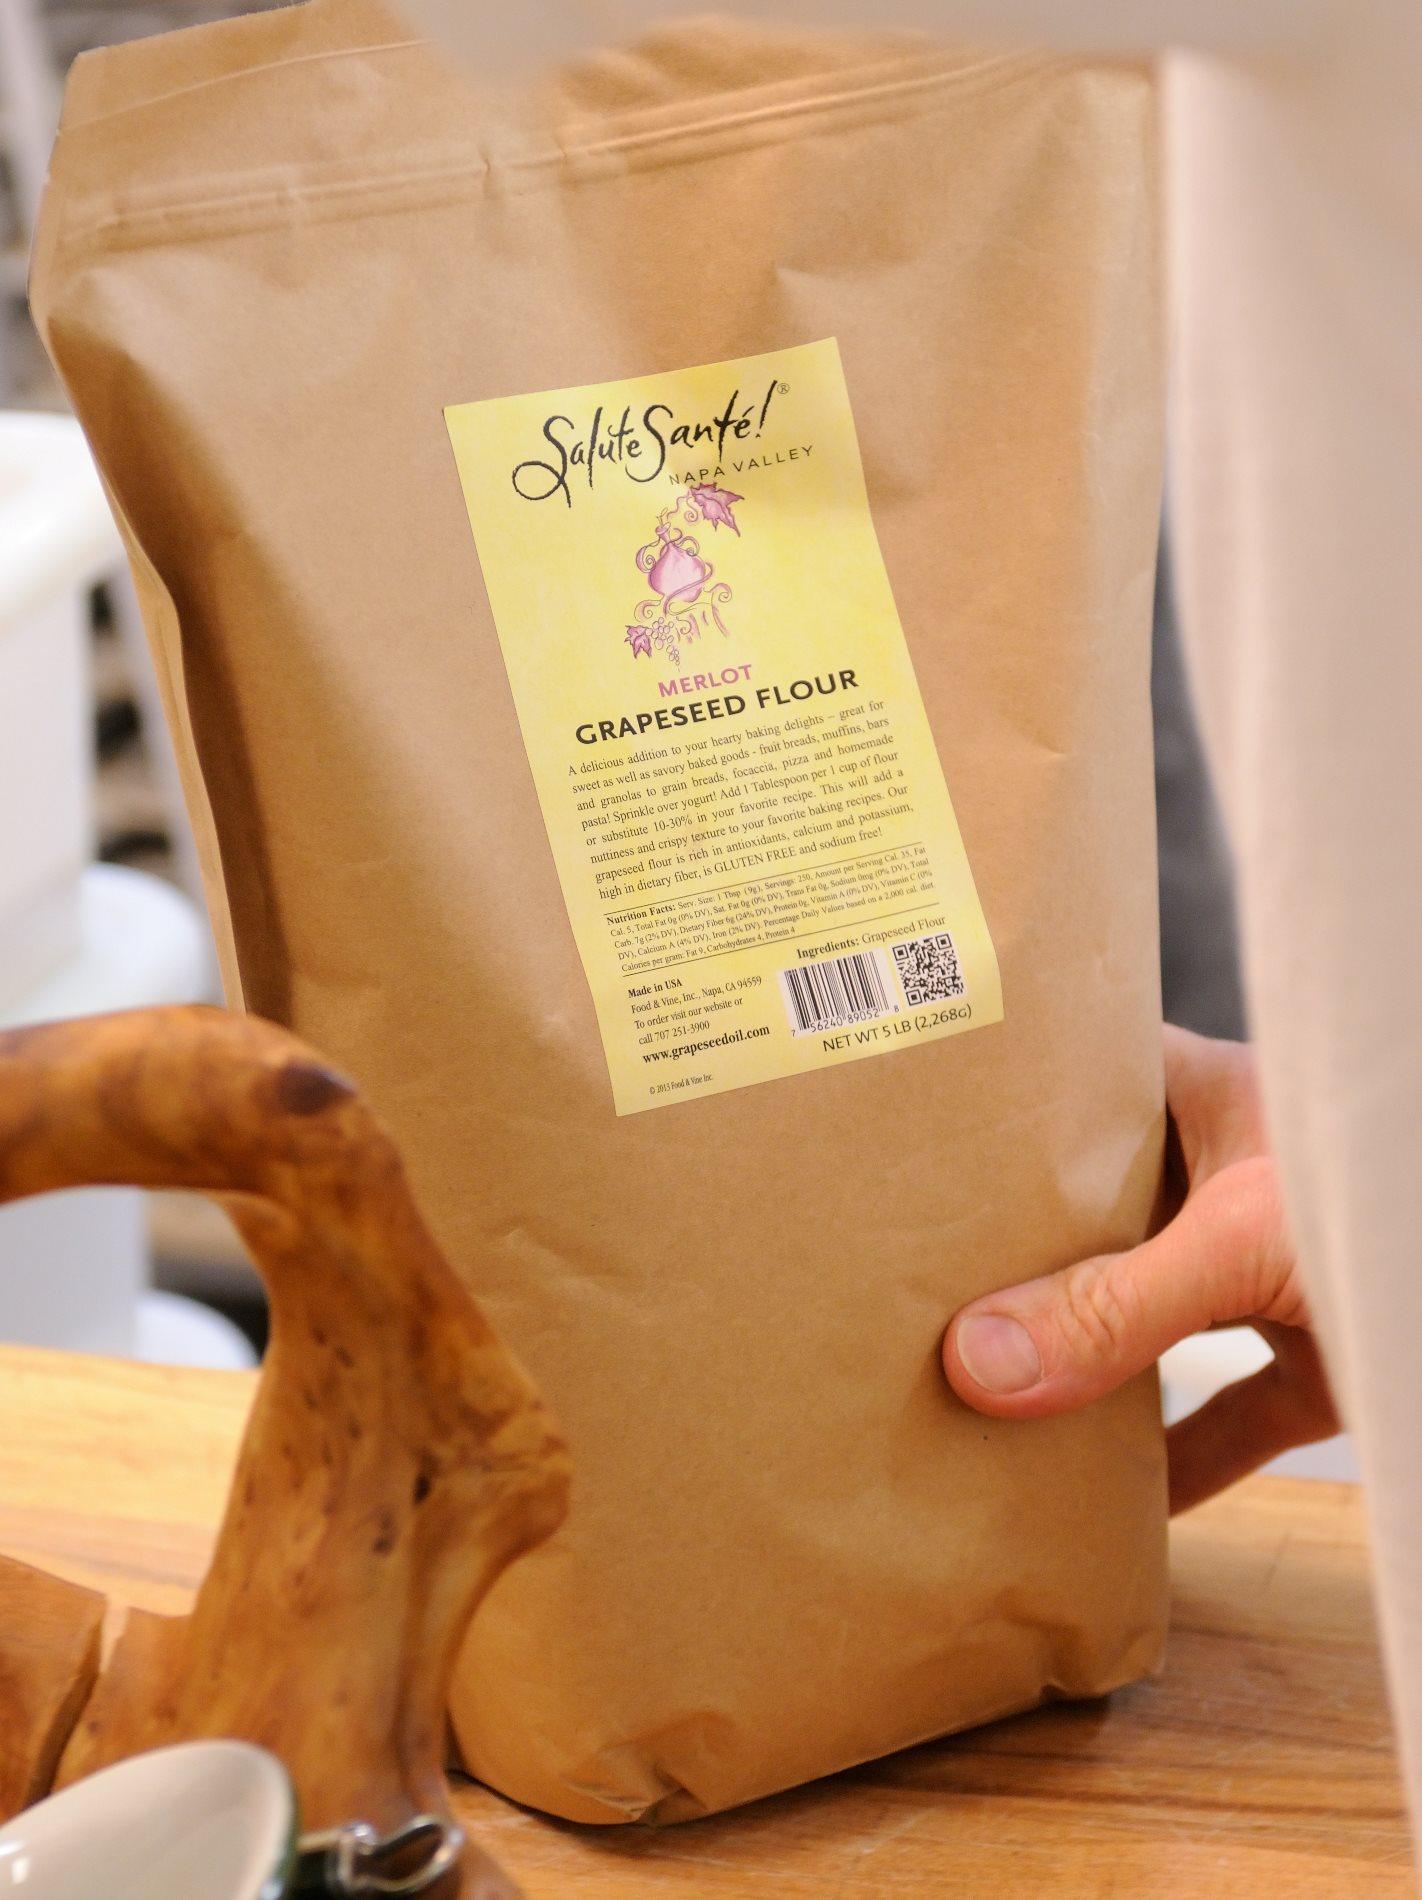 Grapeseed Flour